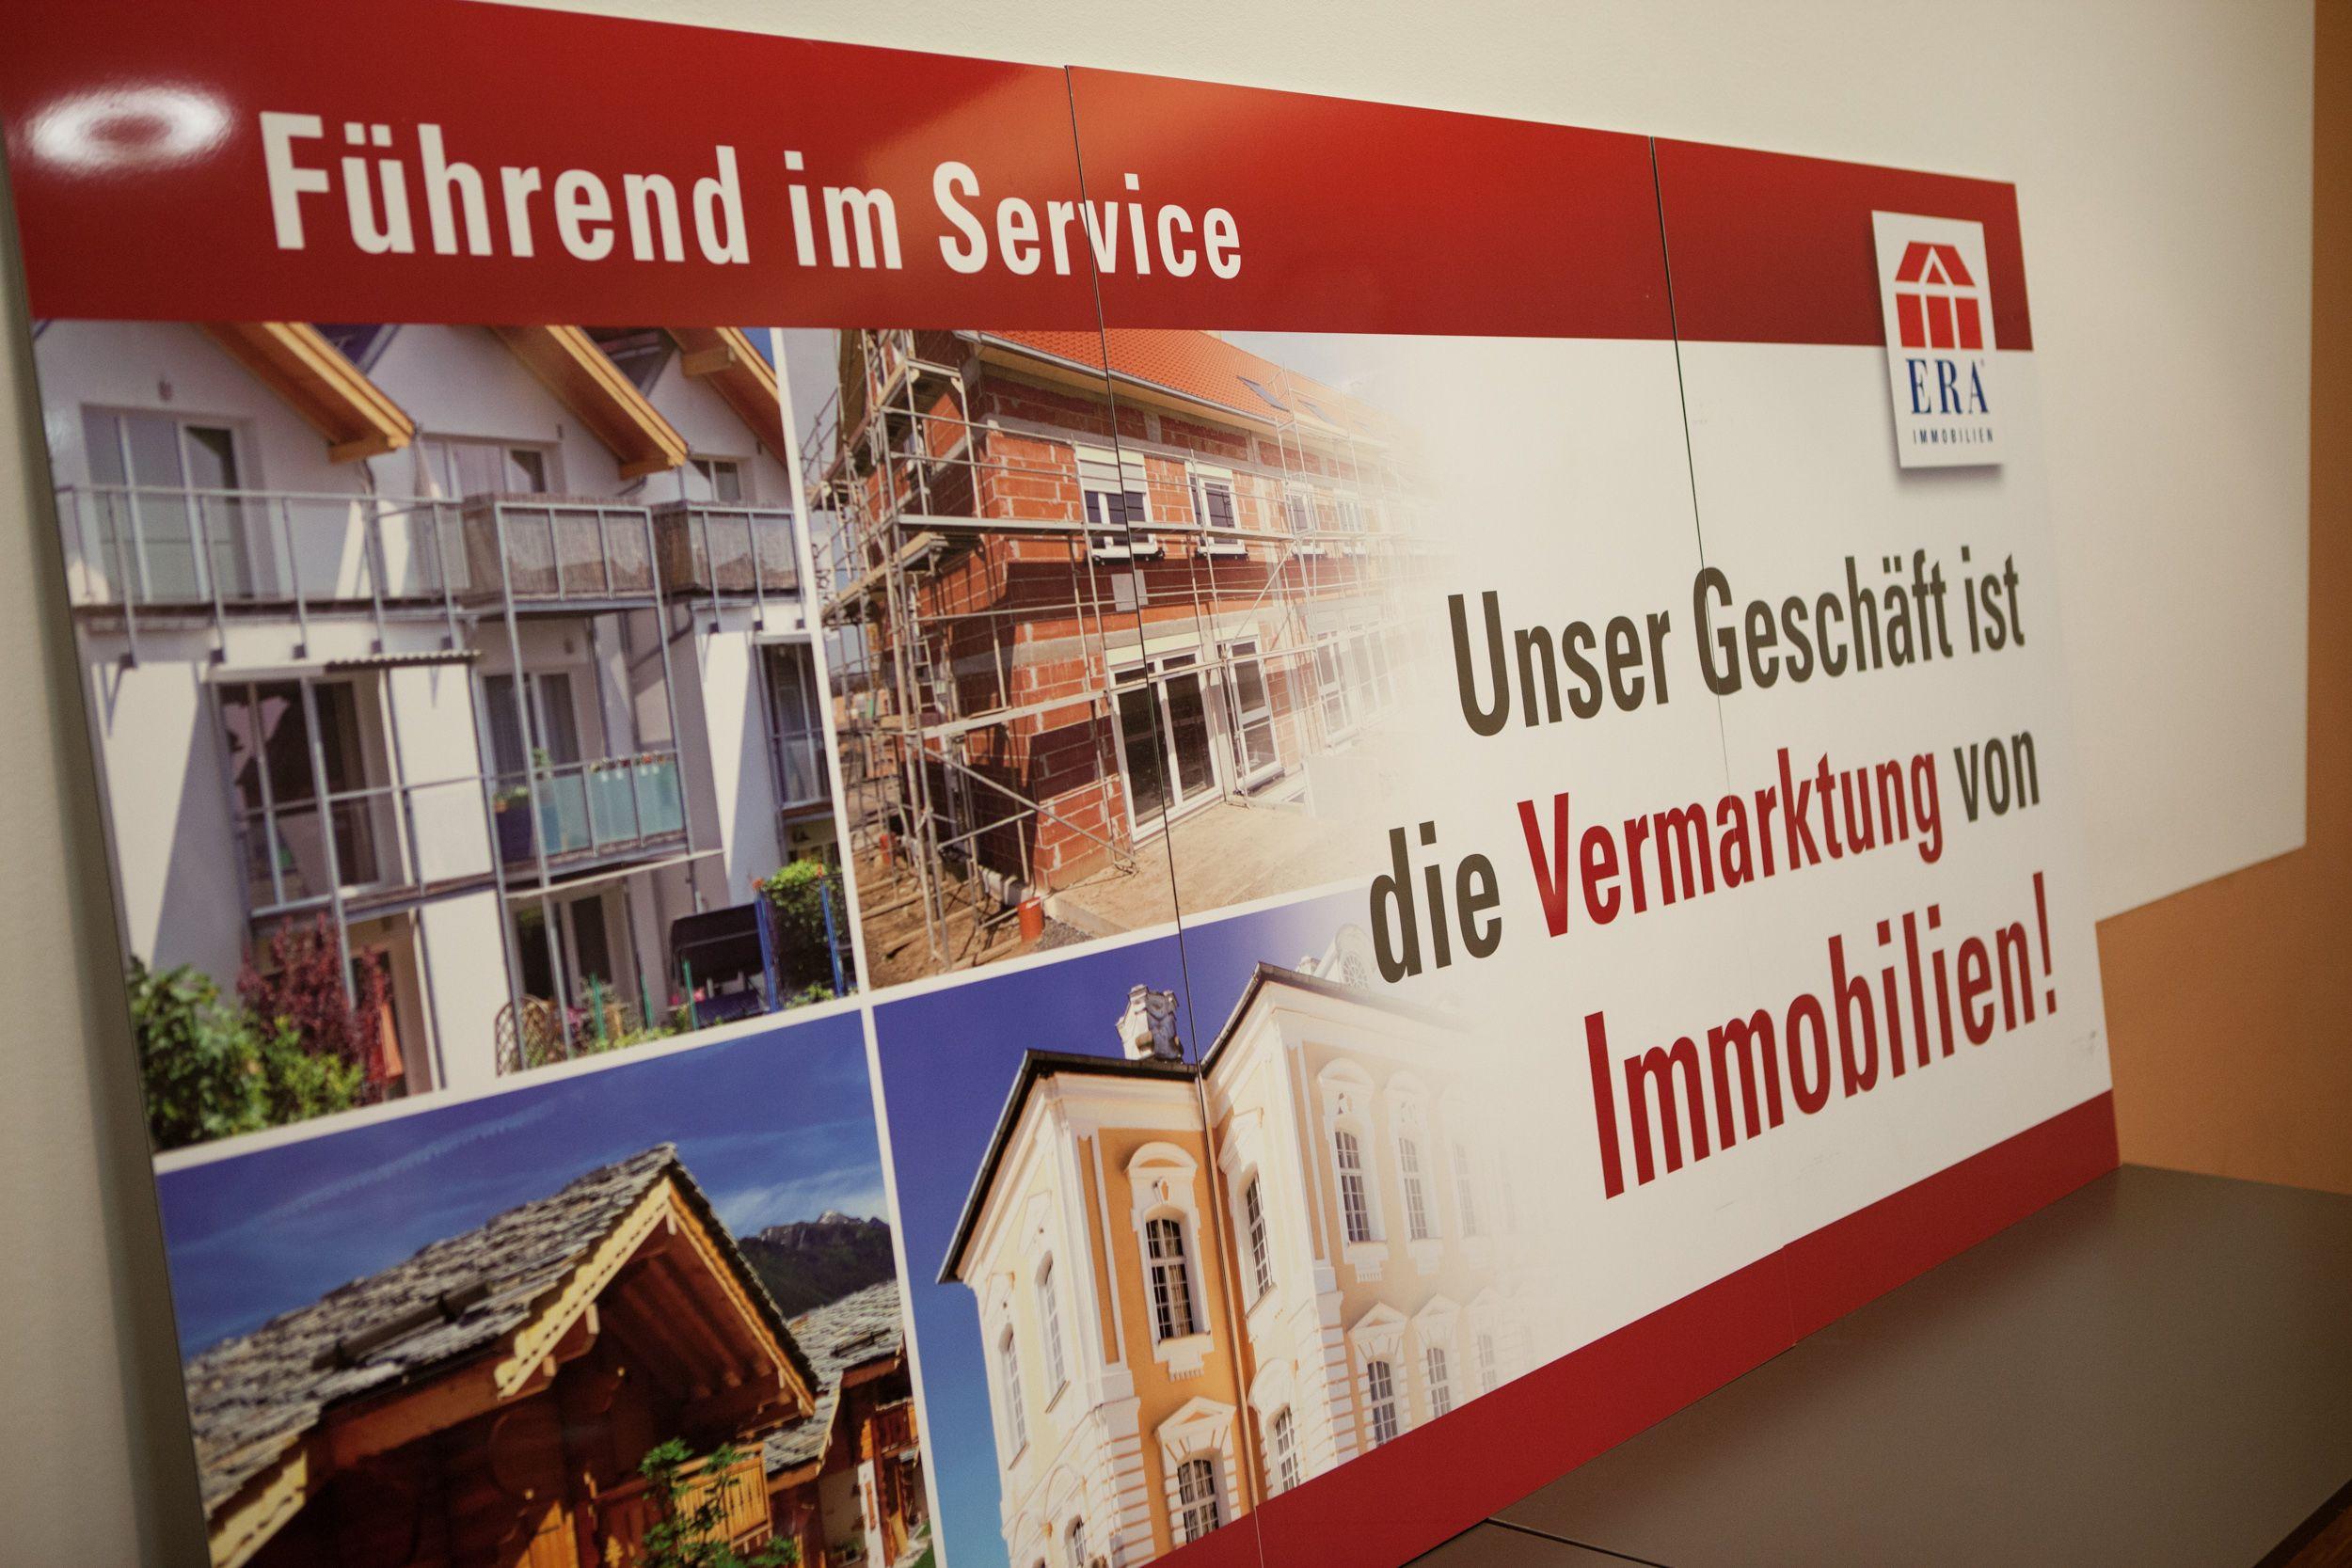 Era Immobilien era immobilien switzerland era estate switzerland branding